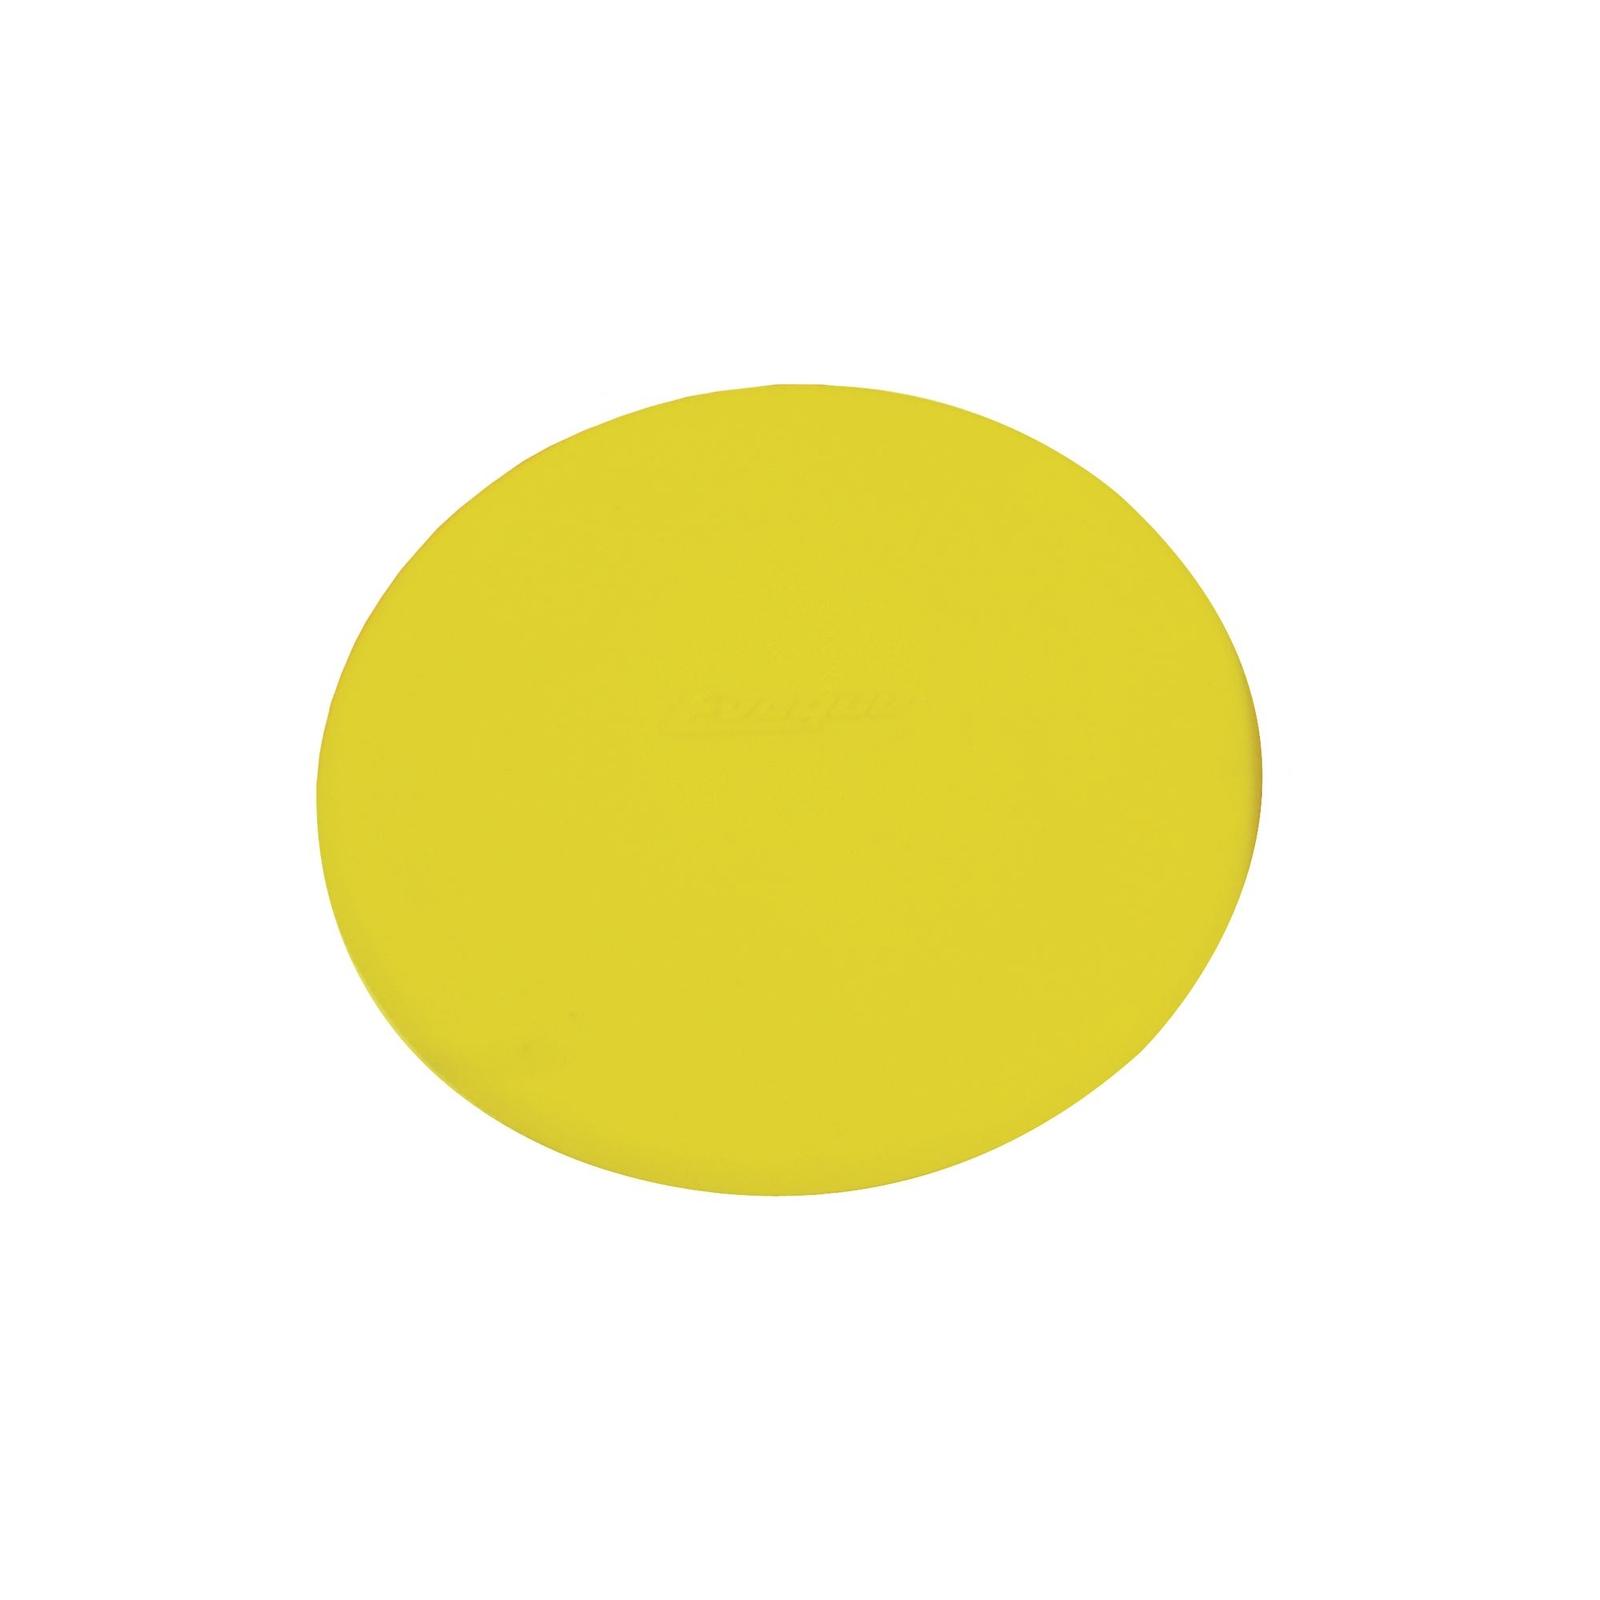 Eveque Primary Discus - Yellow - 200g